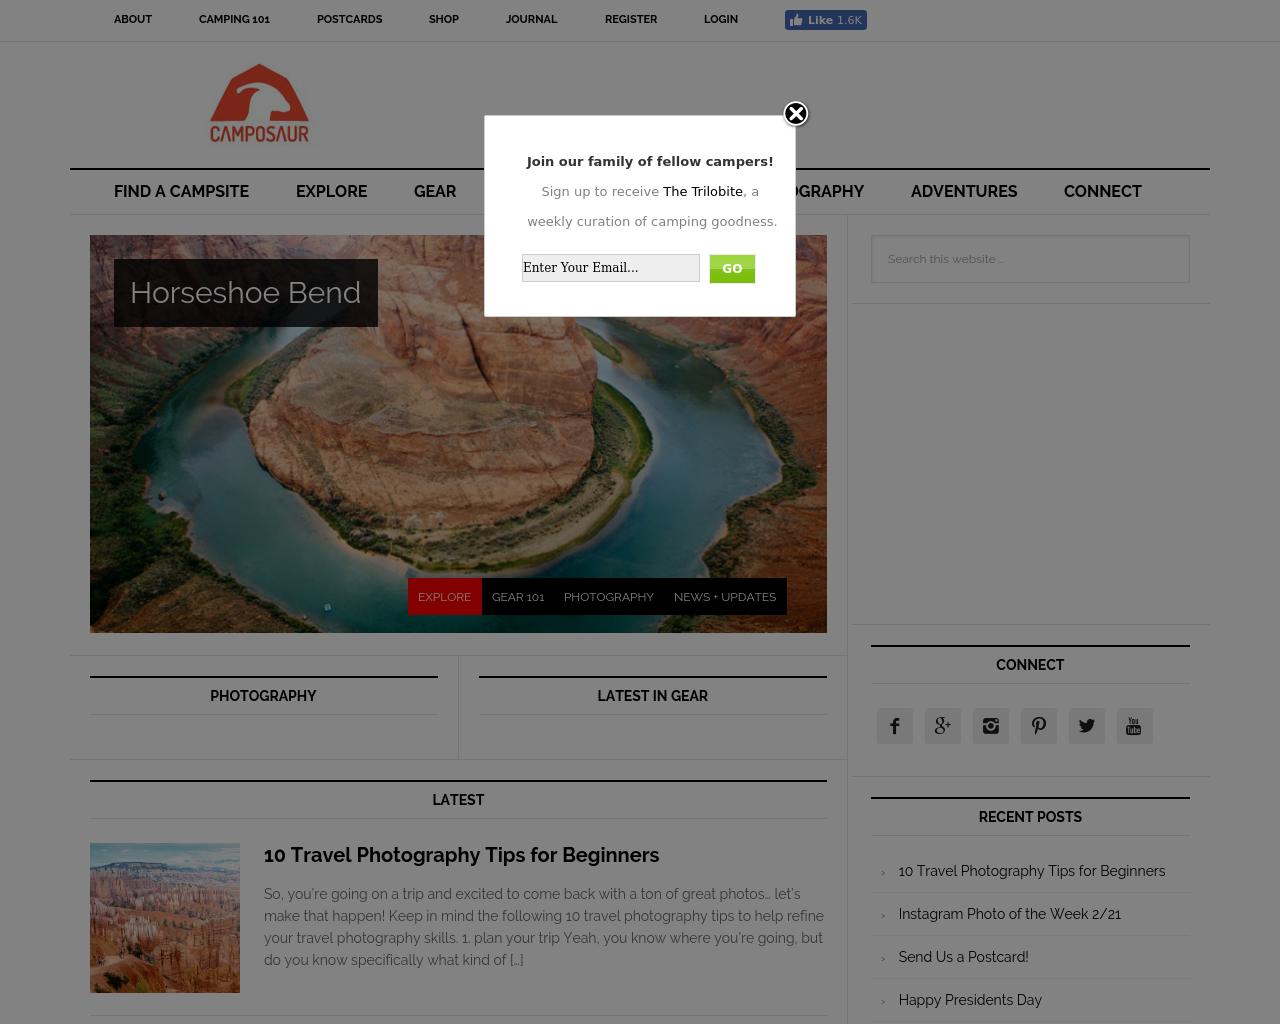 Camposaur-Advertising-Reviews-Pricing